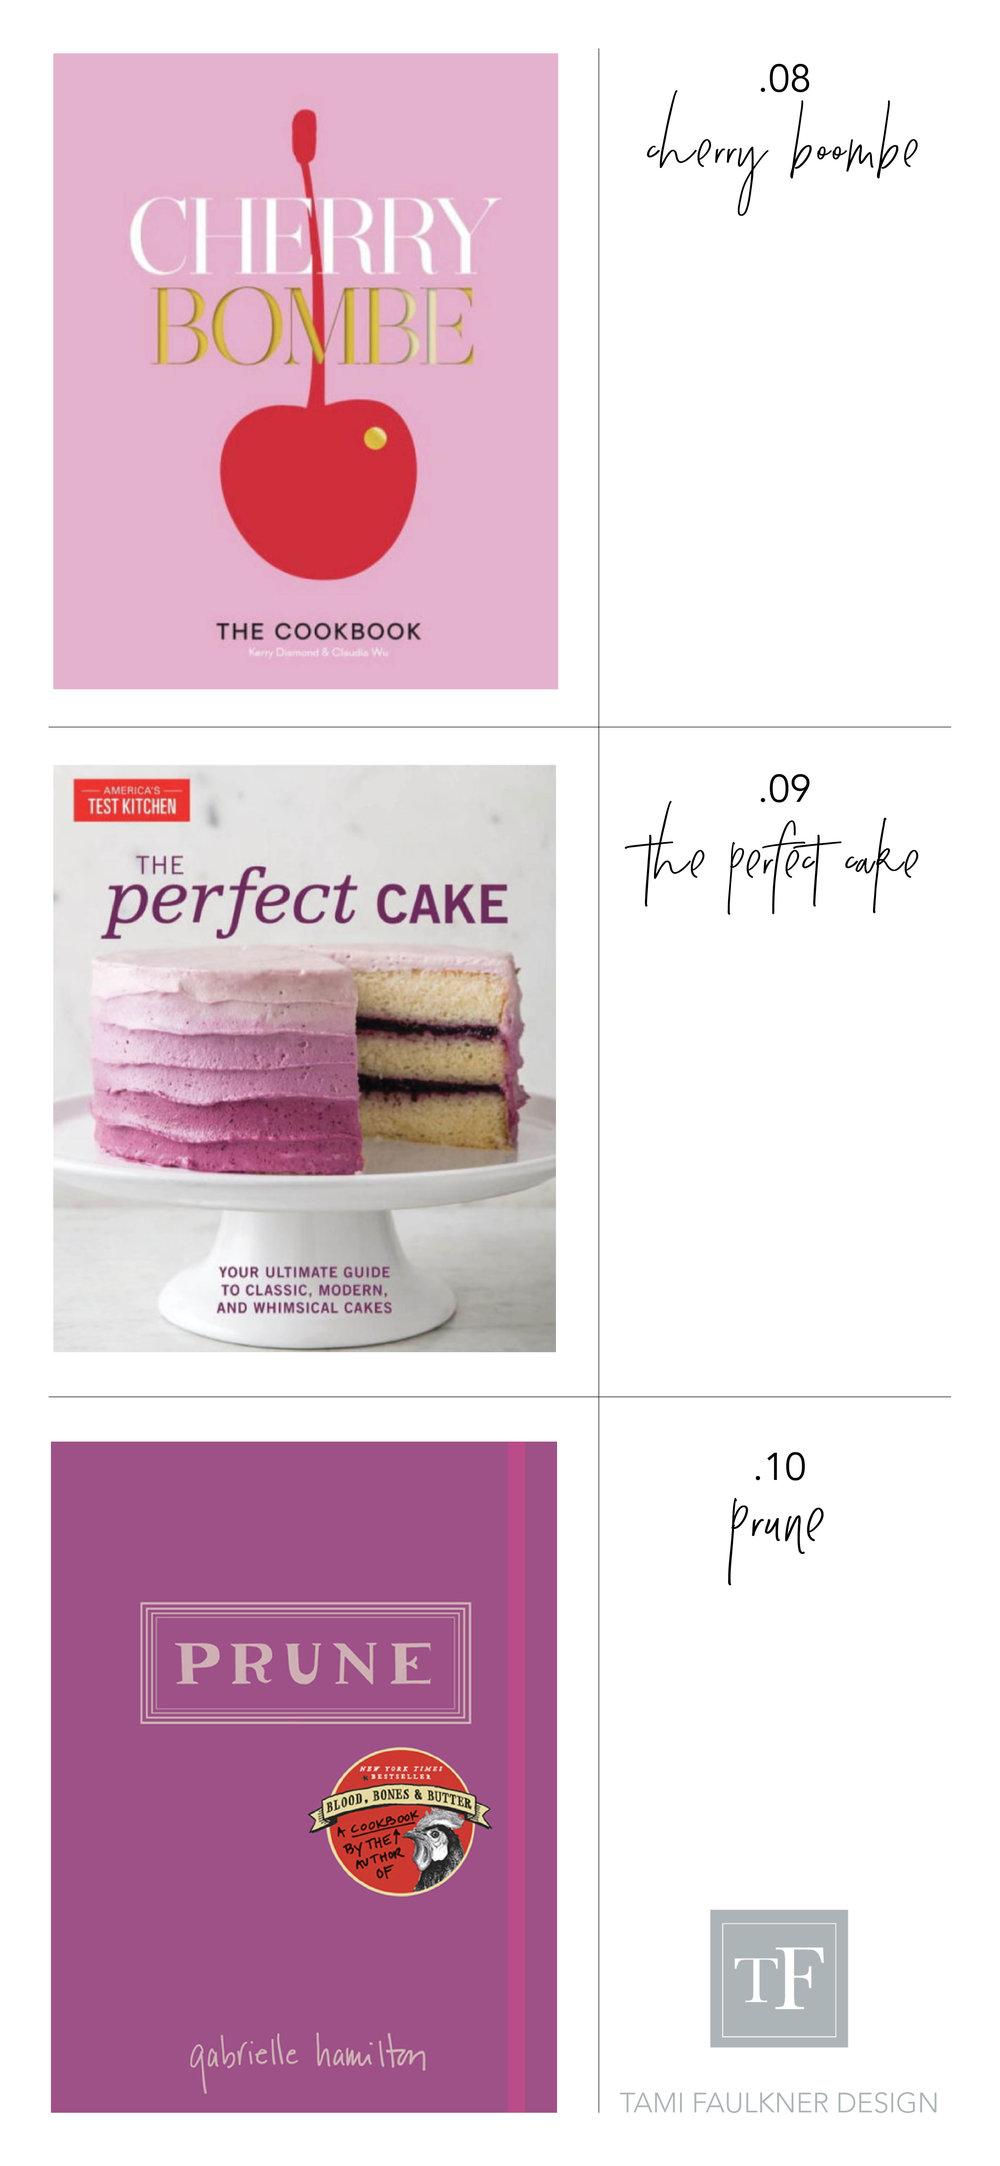 wp simply sundays fav pink cookbooks may18.jpg